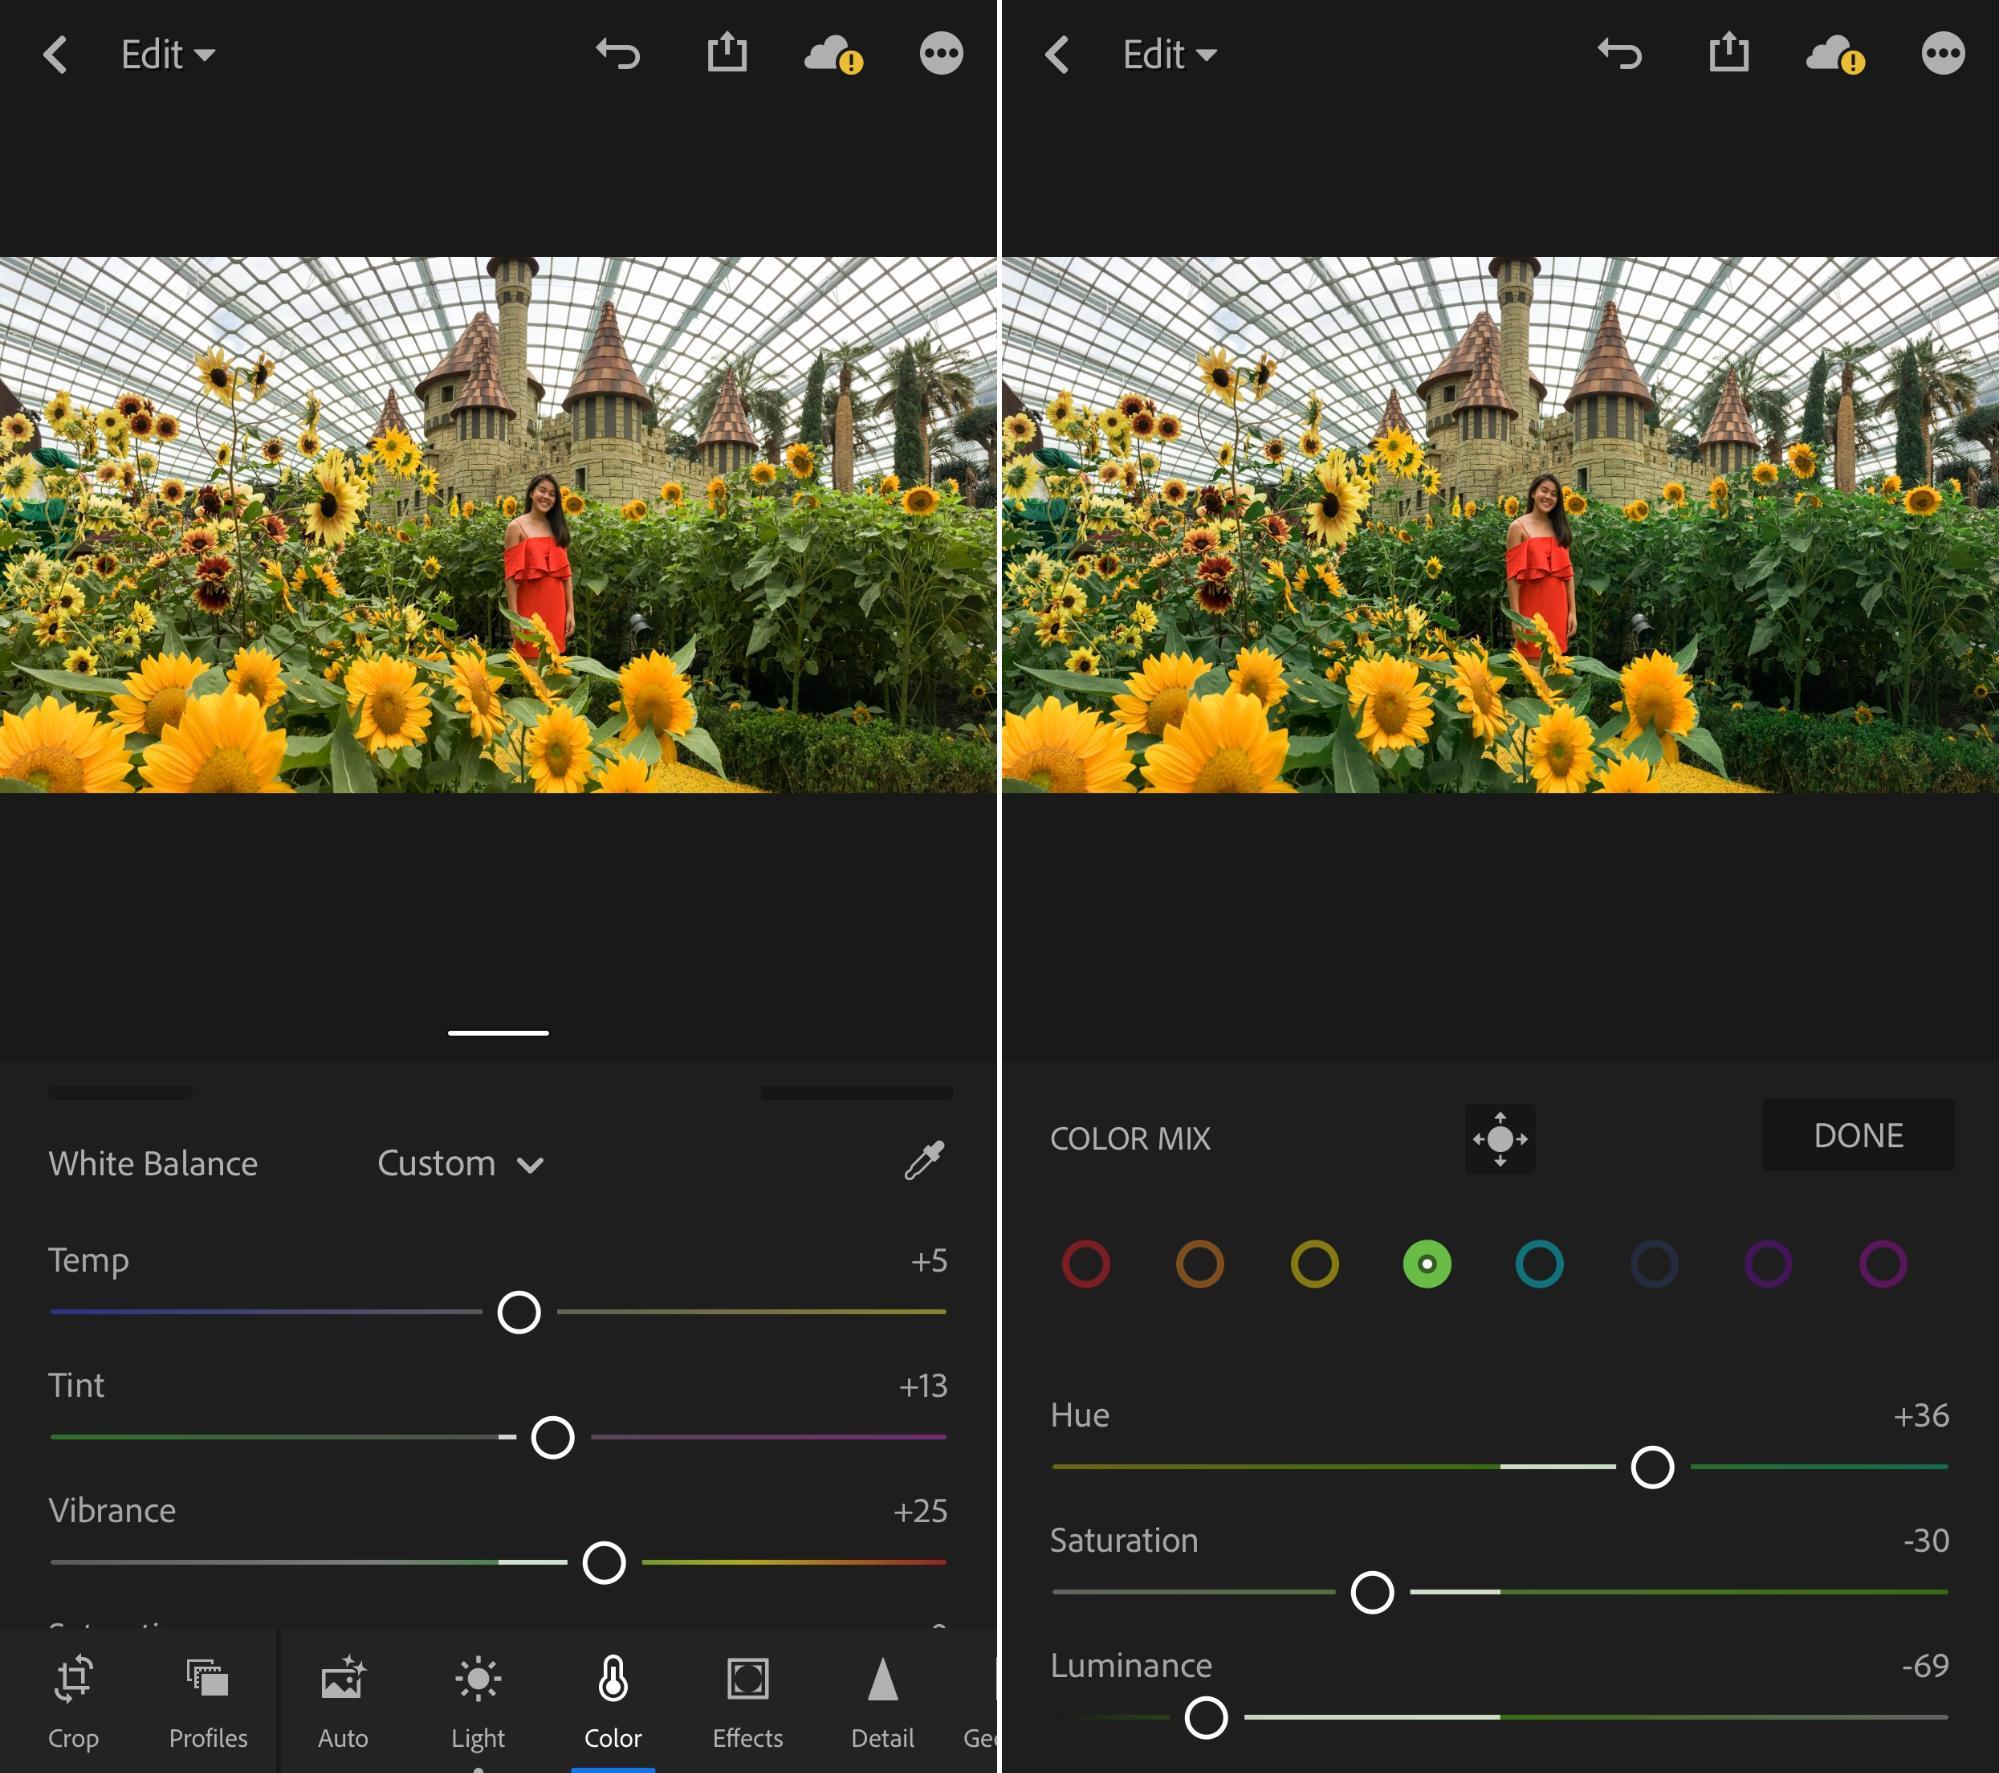 Sunflower surprise ootd using phone GBTB - lightroom colour mix tab